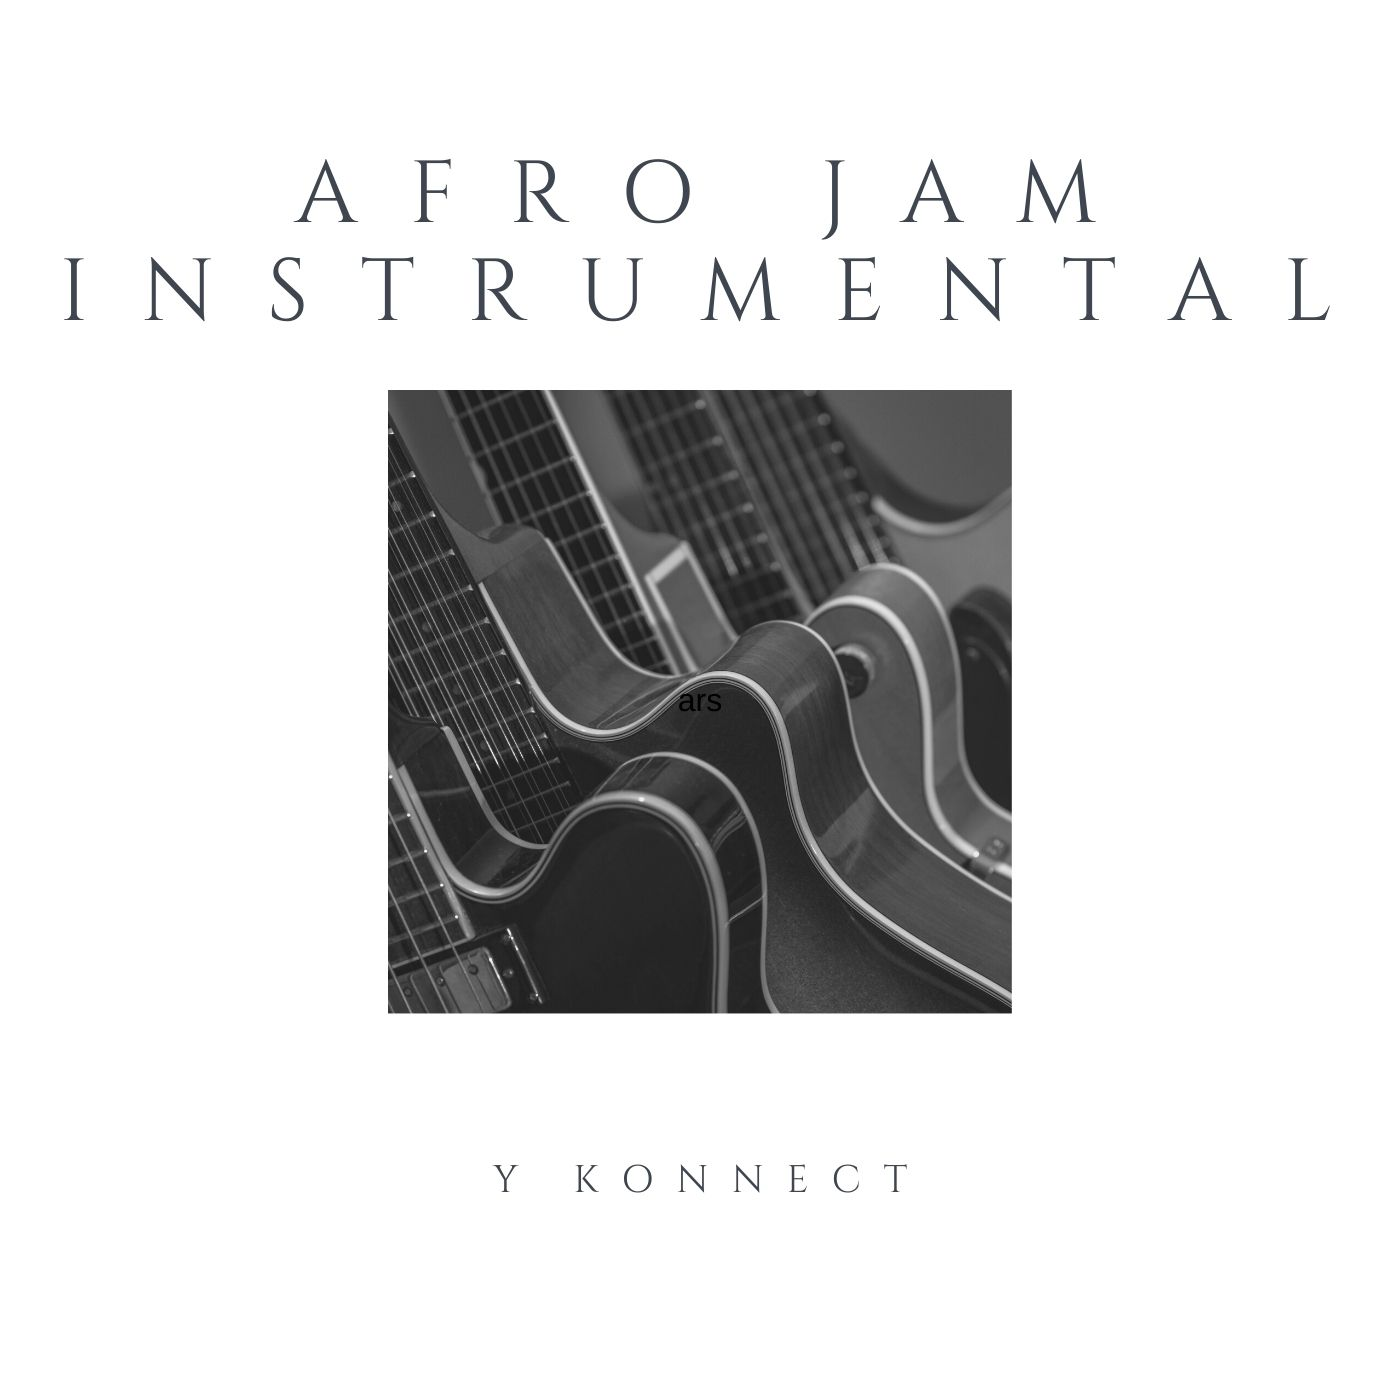 Y Konnect - Afro Jam Instrumental